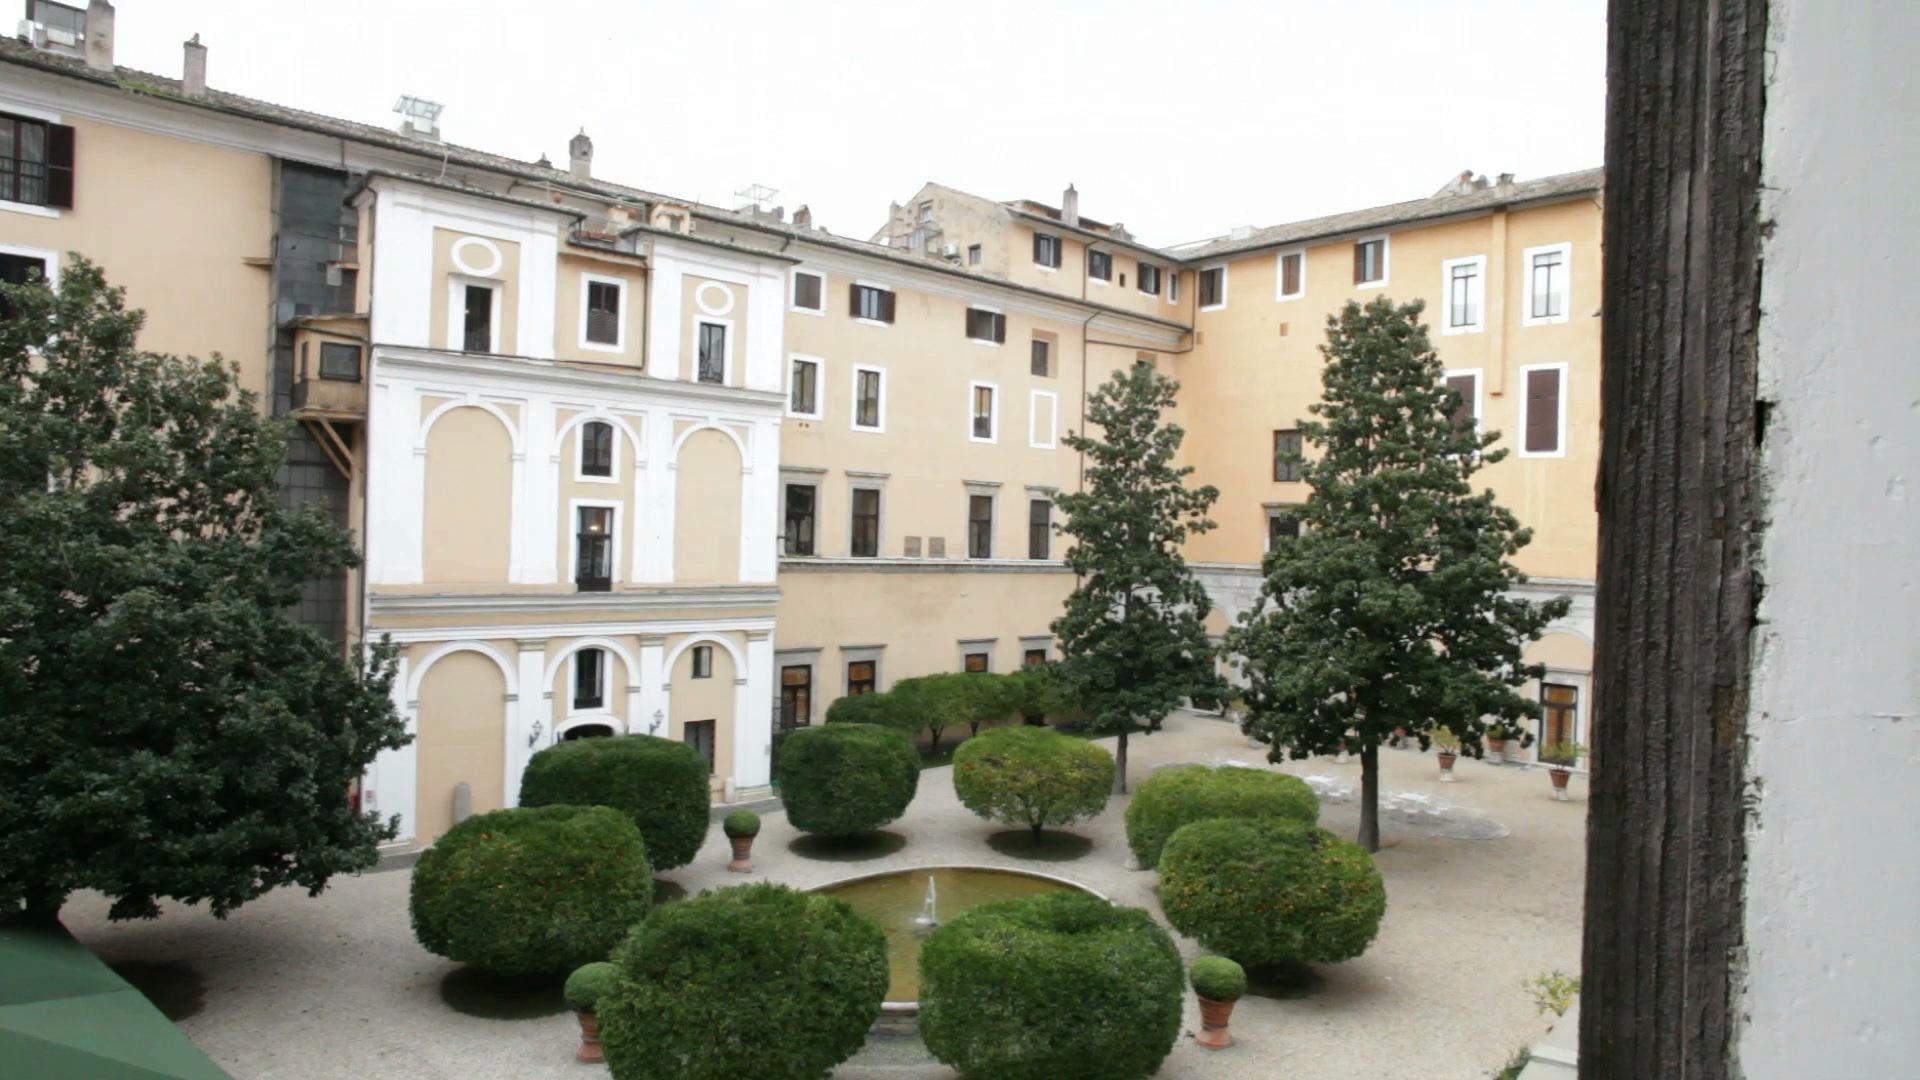 wedding rome galleria cardinale00015.jpeg